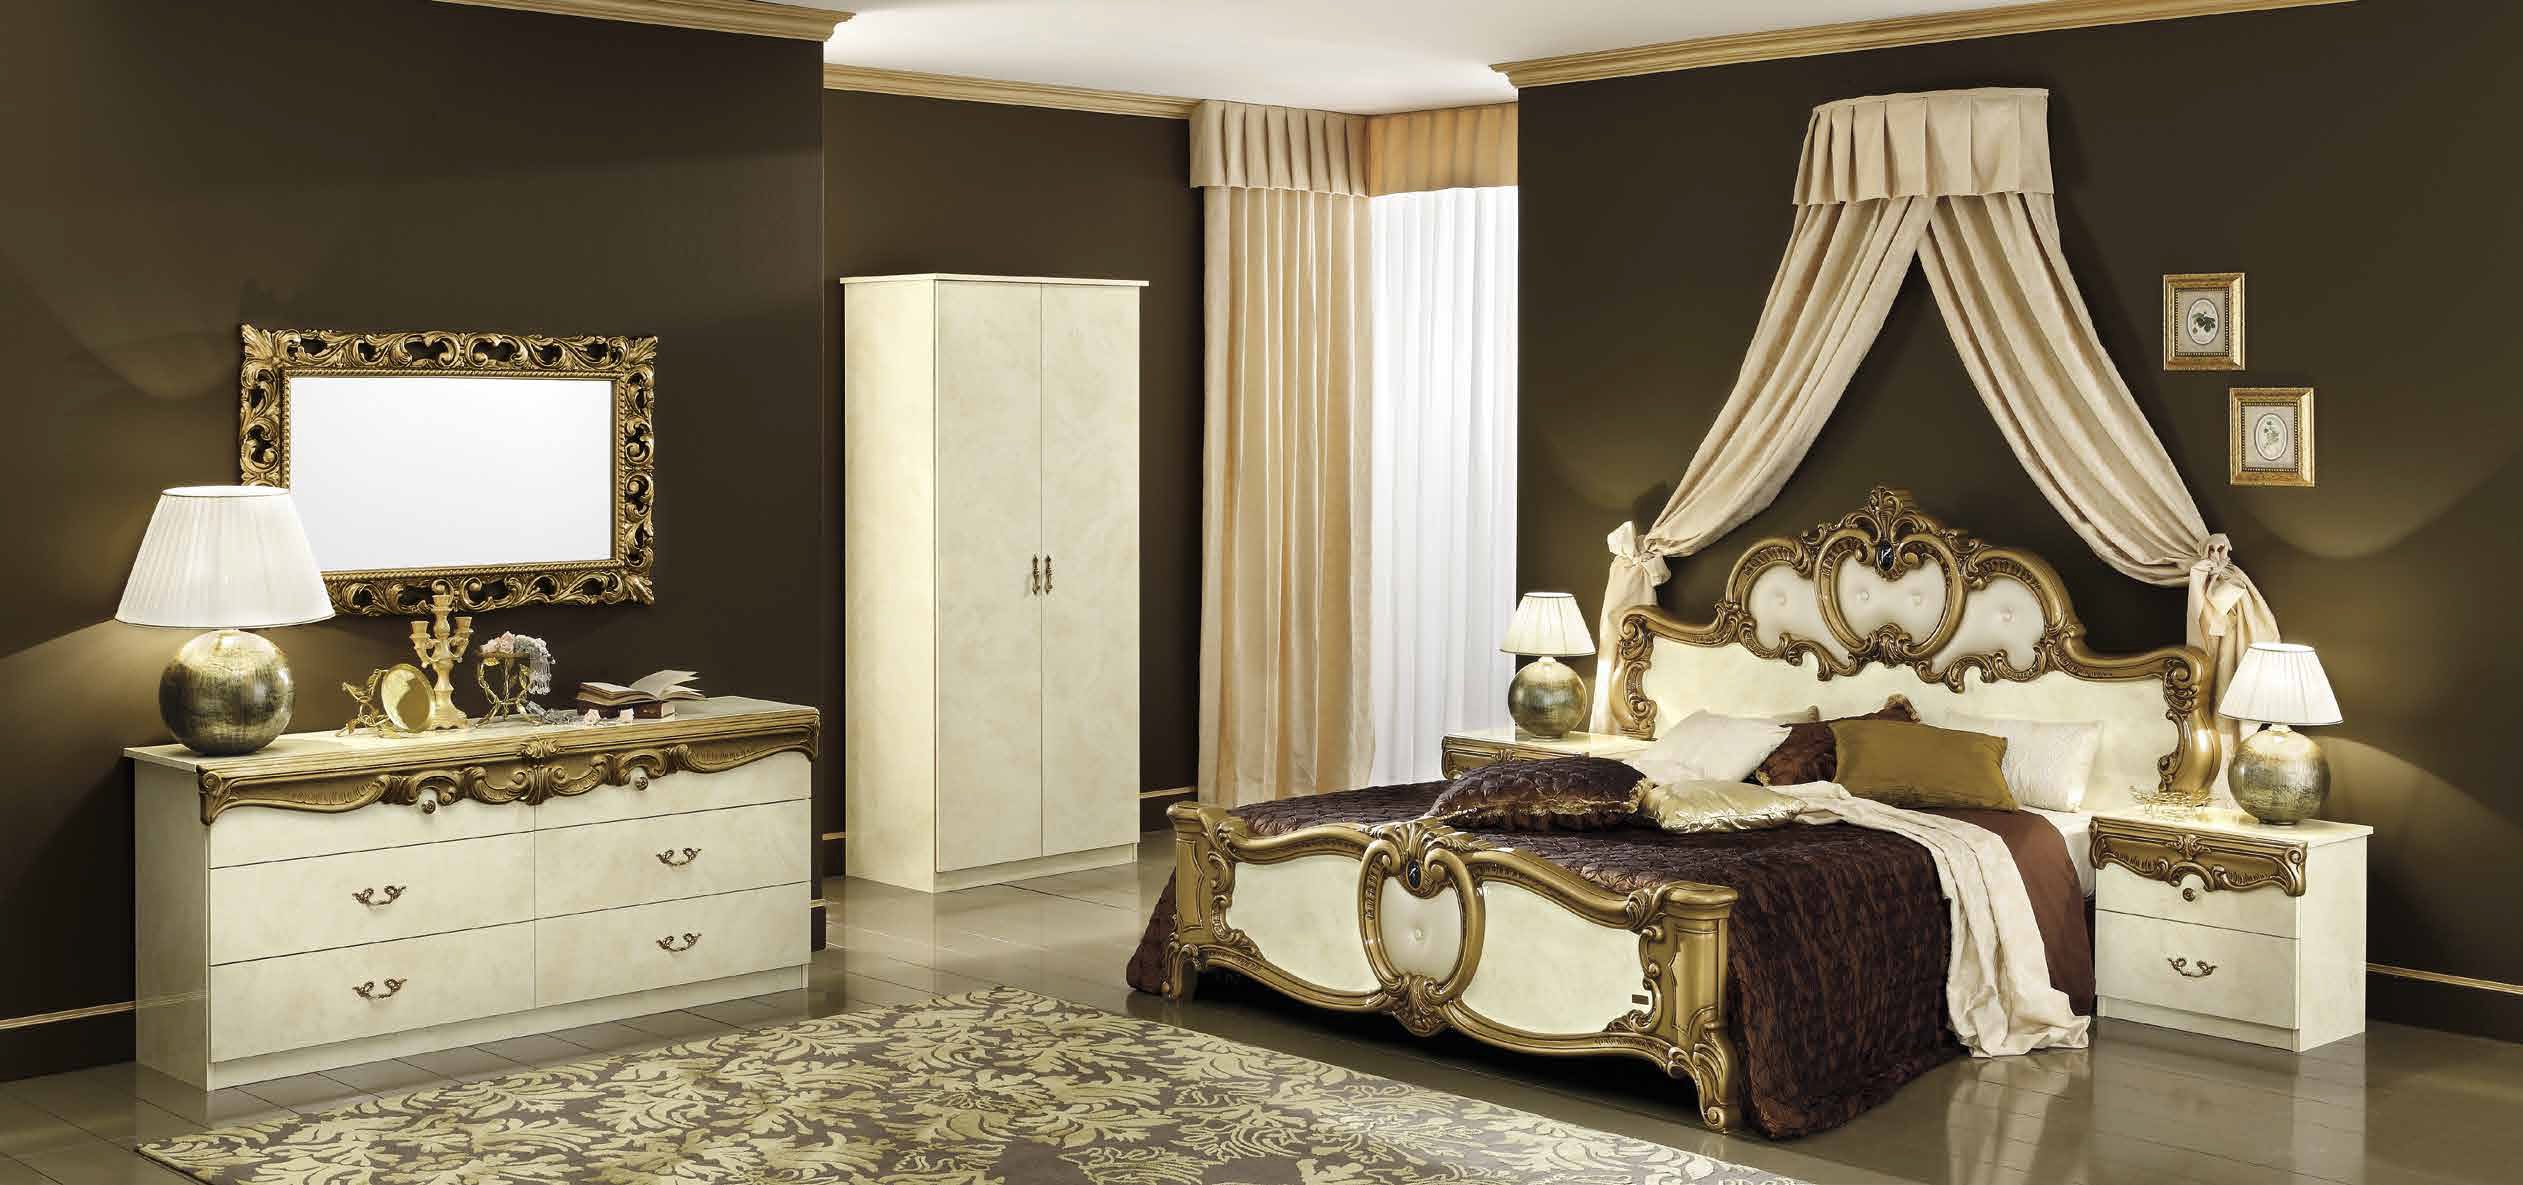 barocco ivory gold schlafzimmer - Schlafzimmer Gold